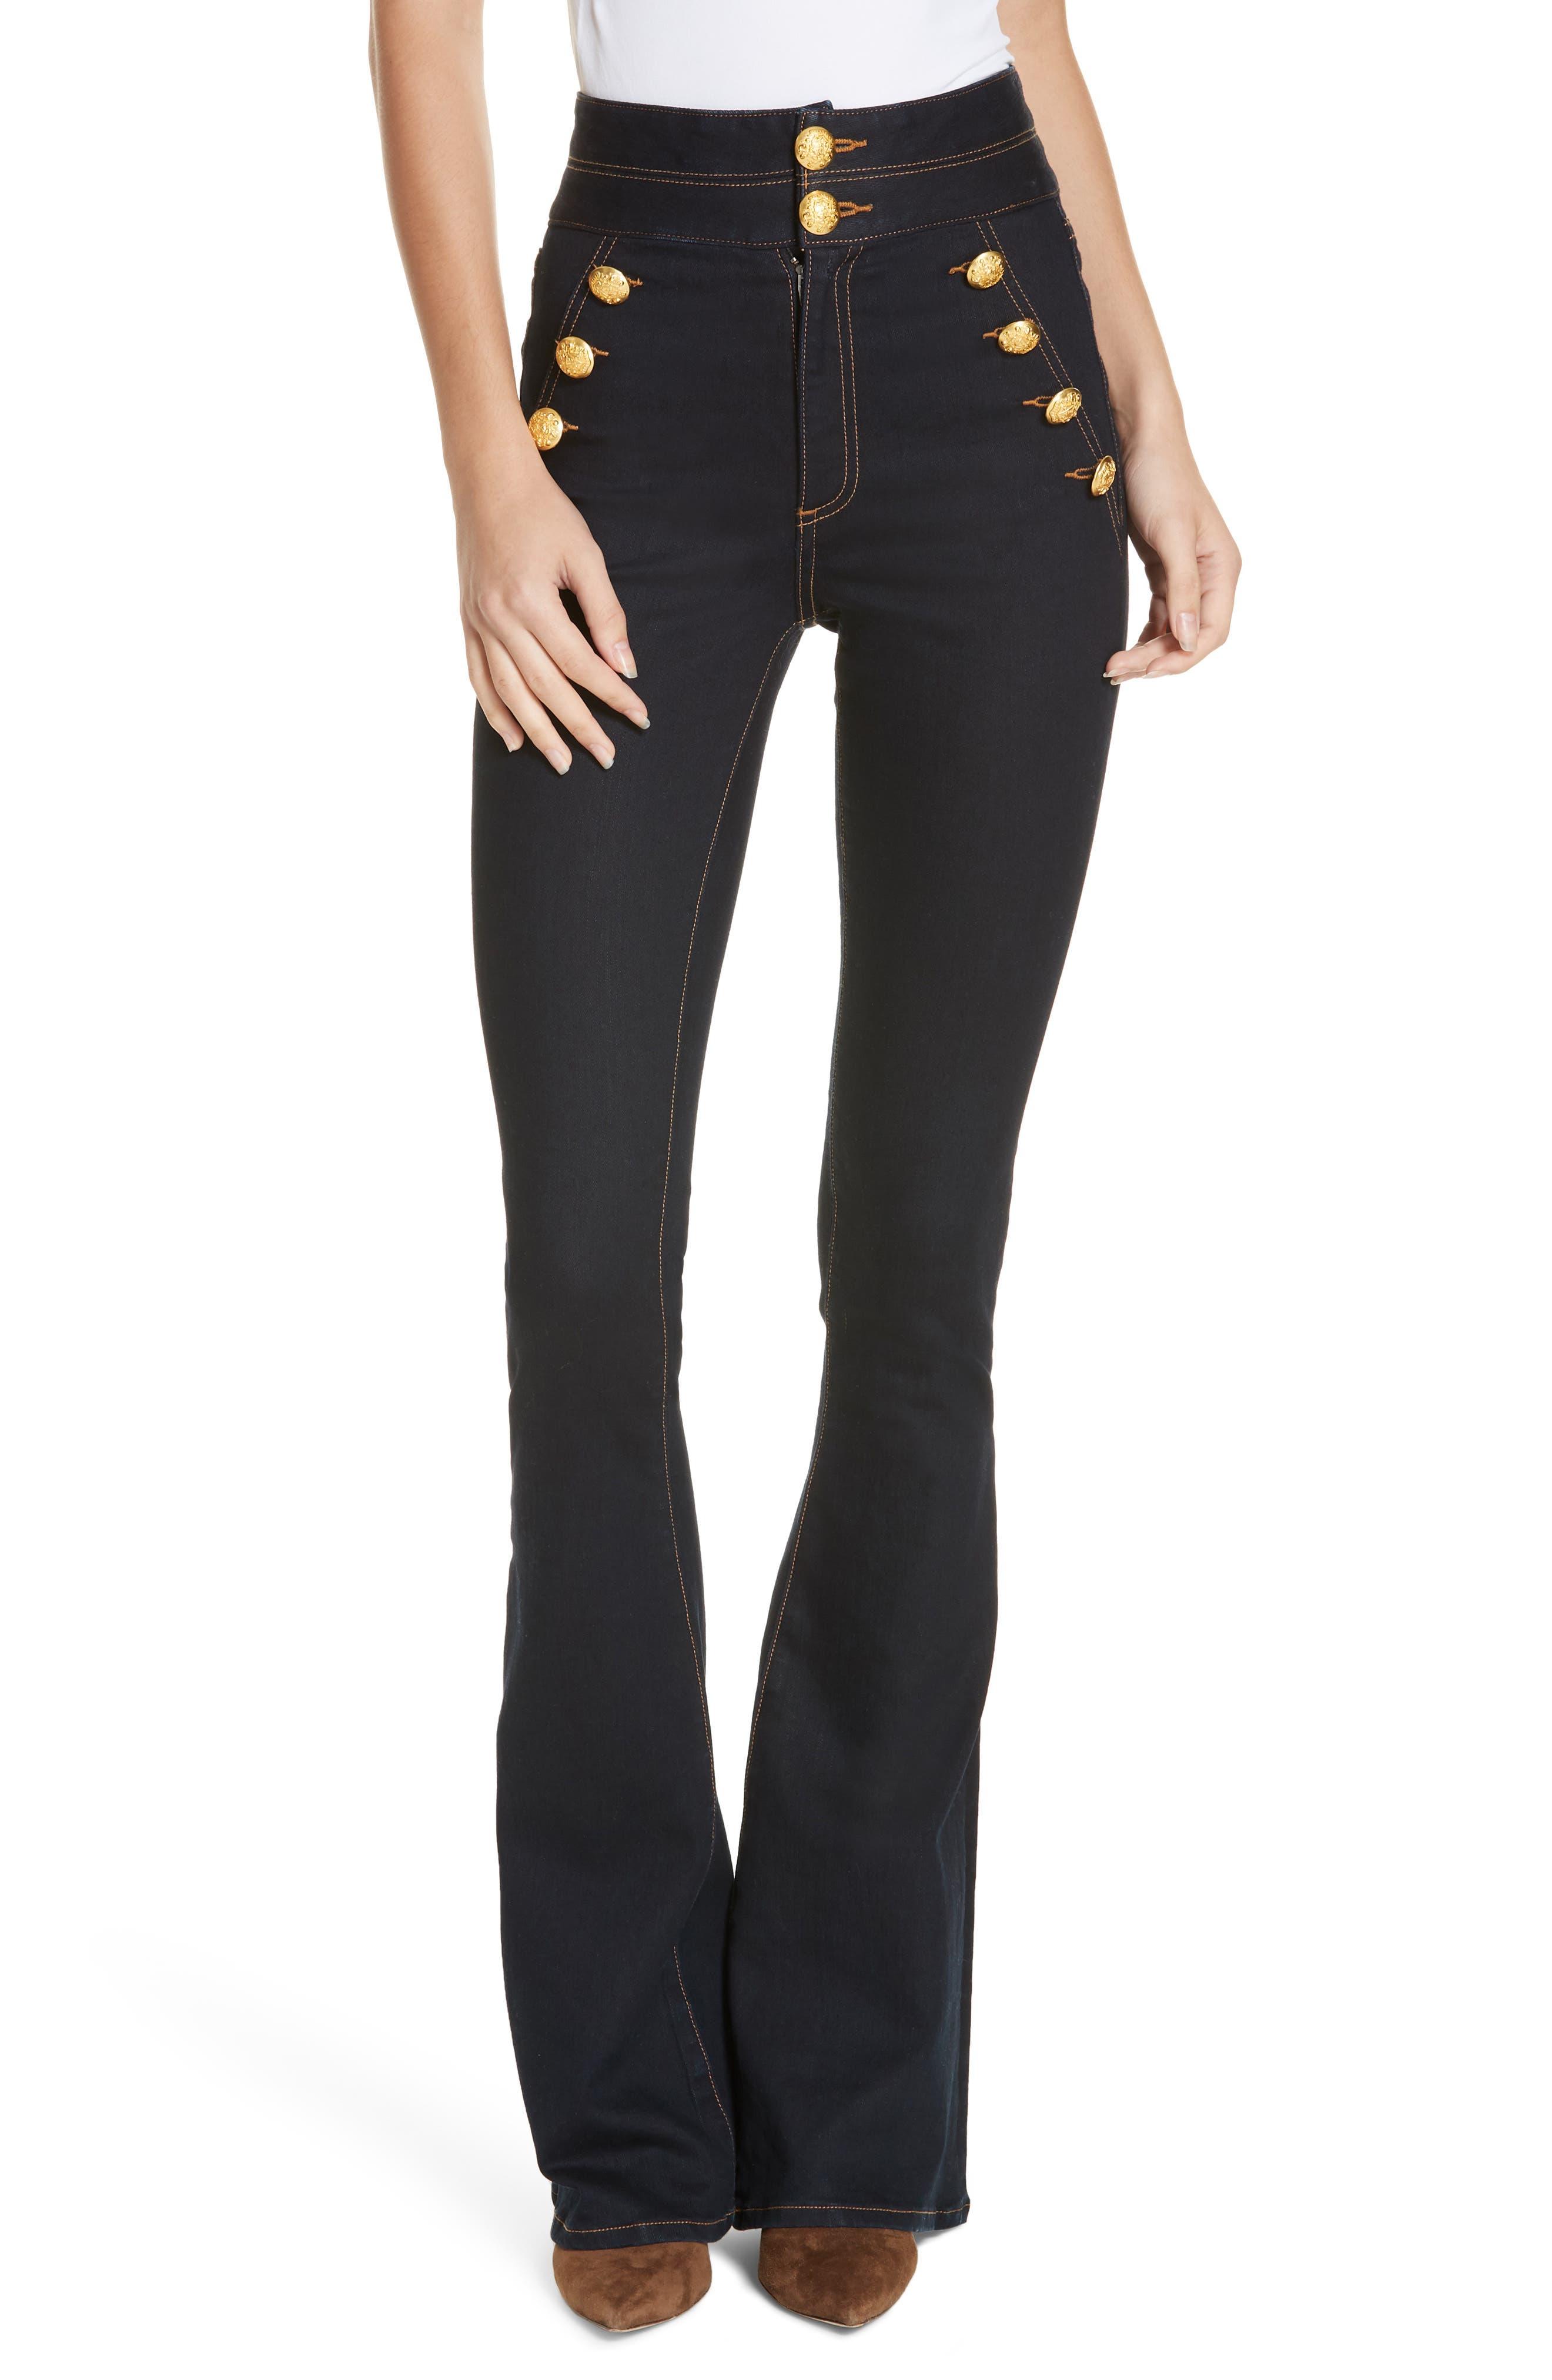 VERONICA BEARD, Dalida Button Detail Skinny Flare Jeans, Main thumbnail 1, color, INDIGO